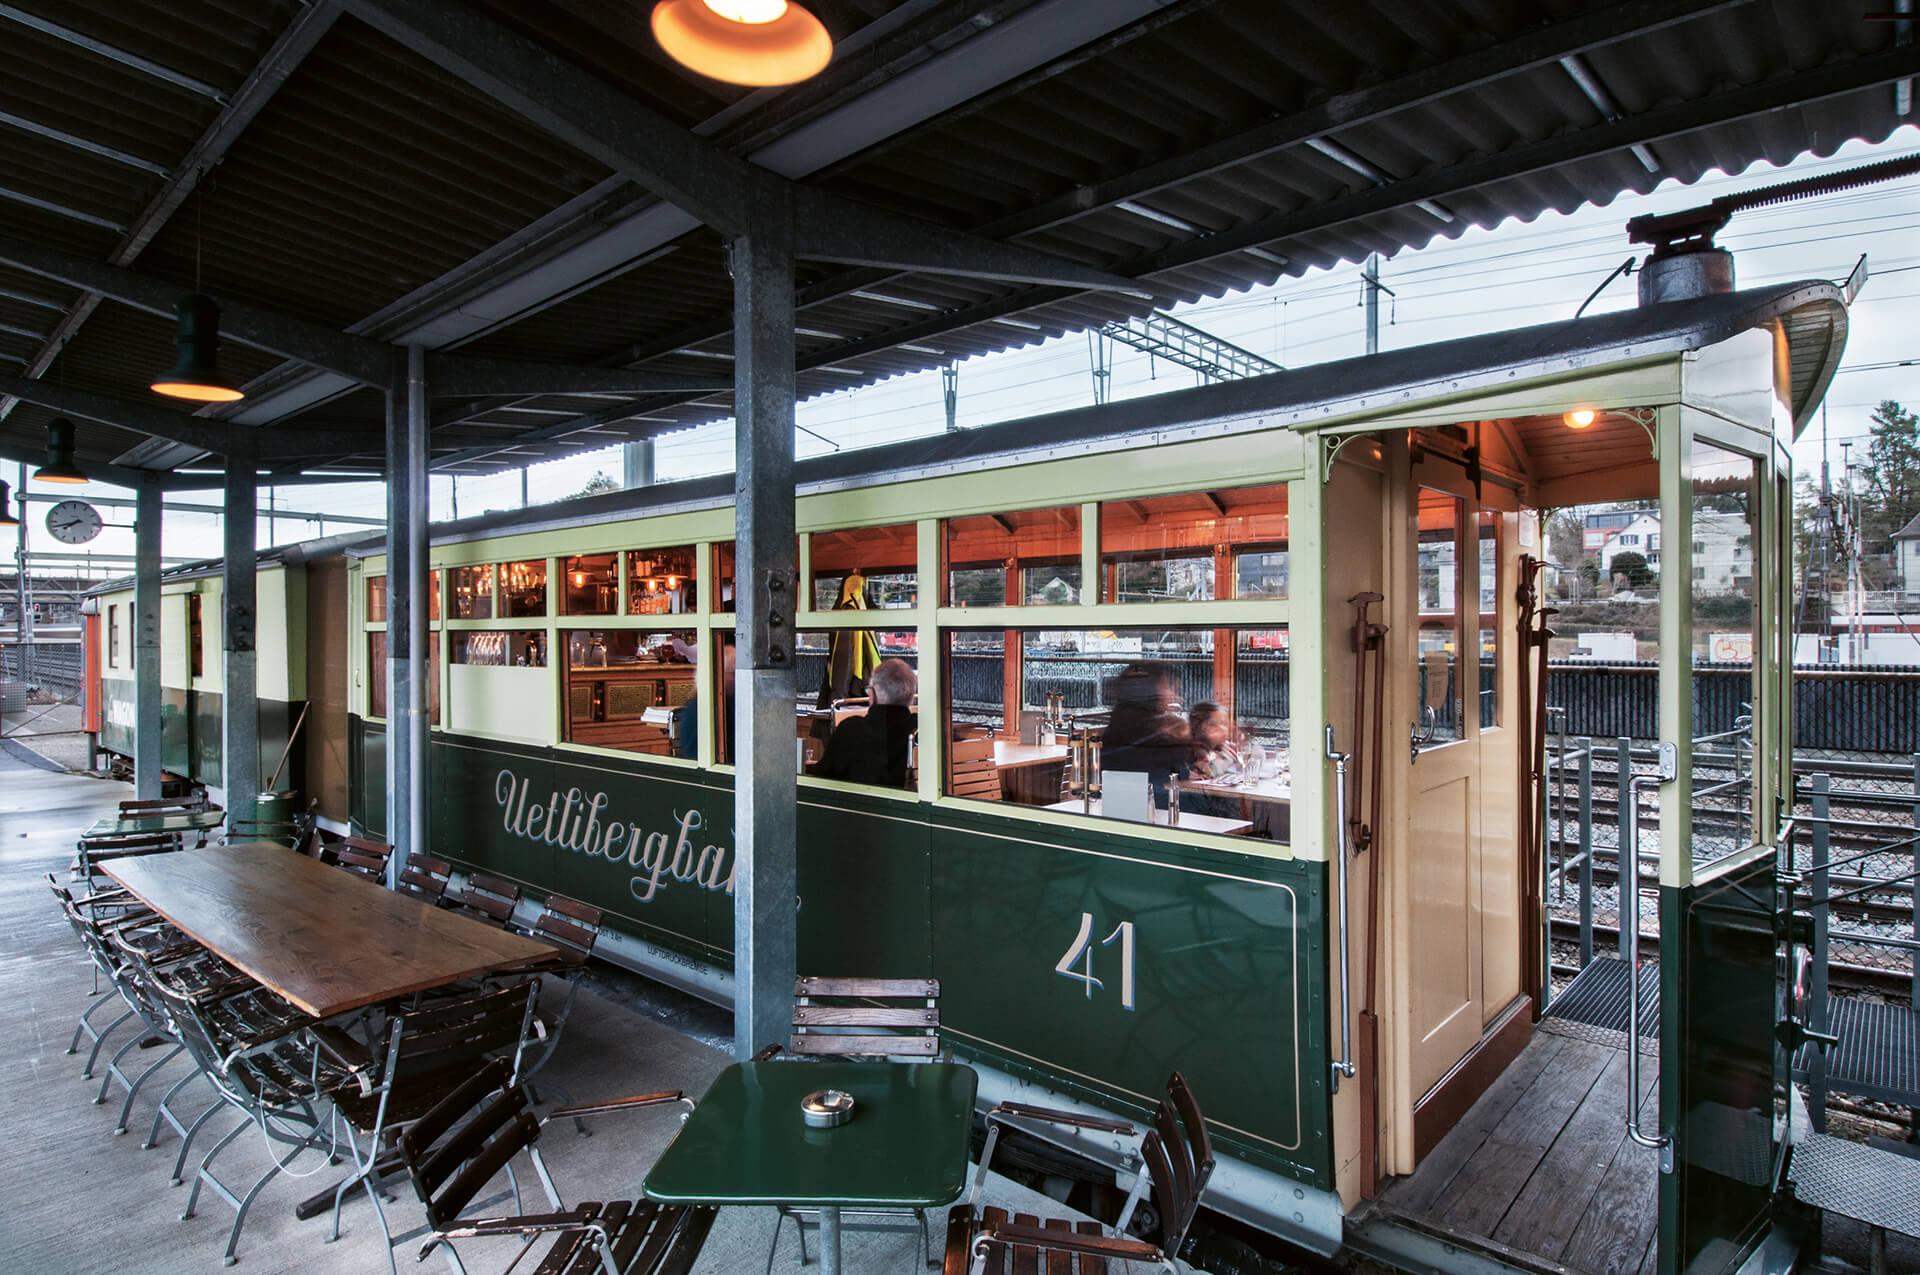 Les wagons, Winterthur ZH